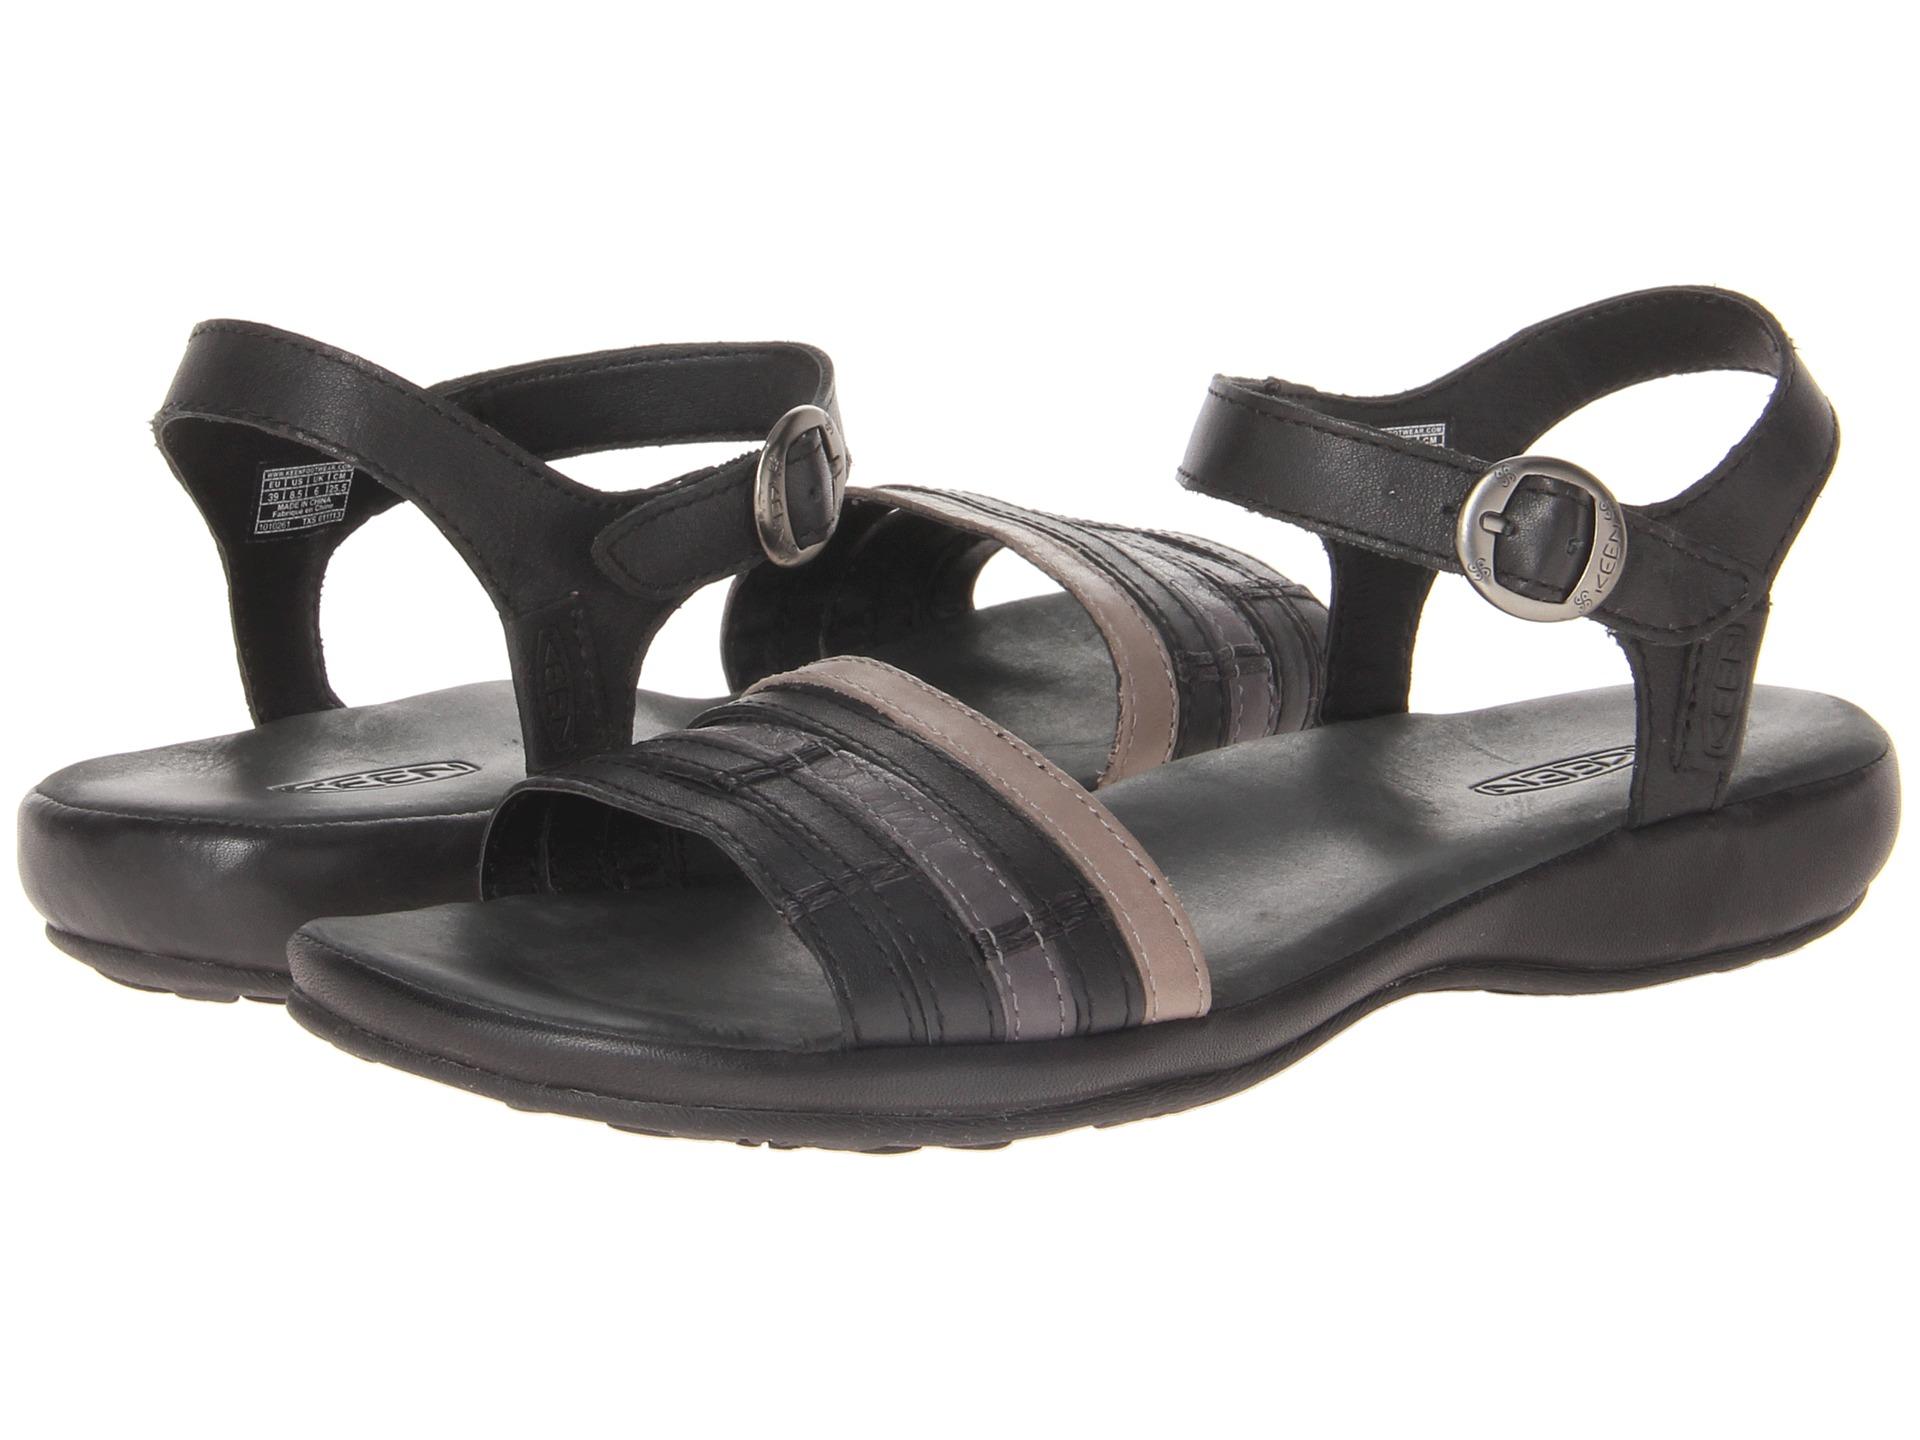 Keen emerald city outdoor sandals for Emerald city nickname